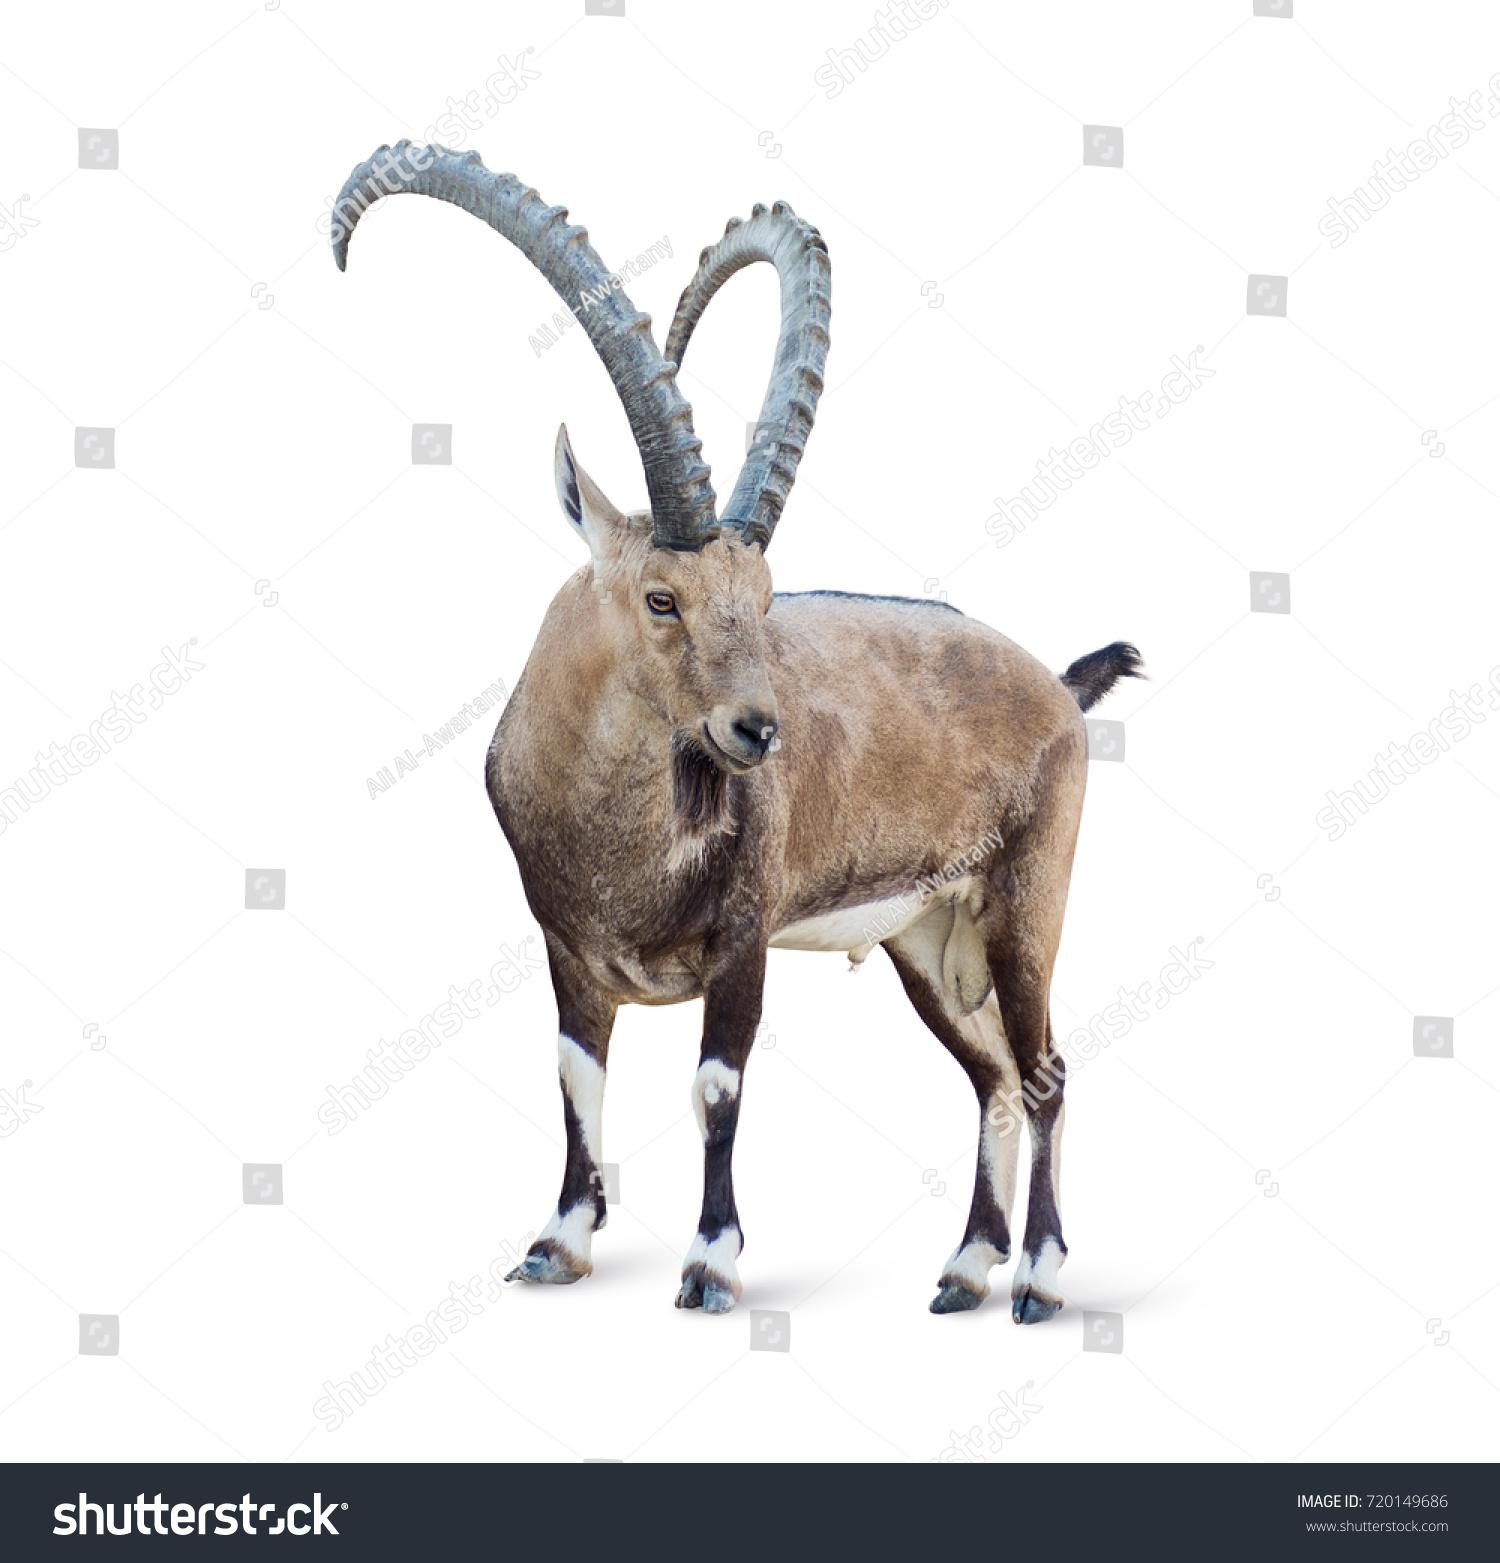 stock-photo-alpine-ibex-isolated-on-whit